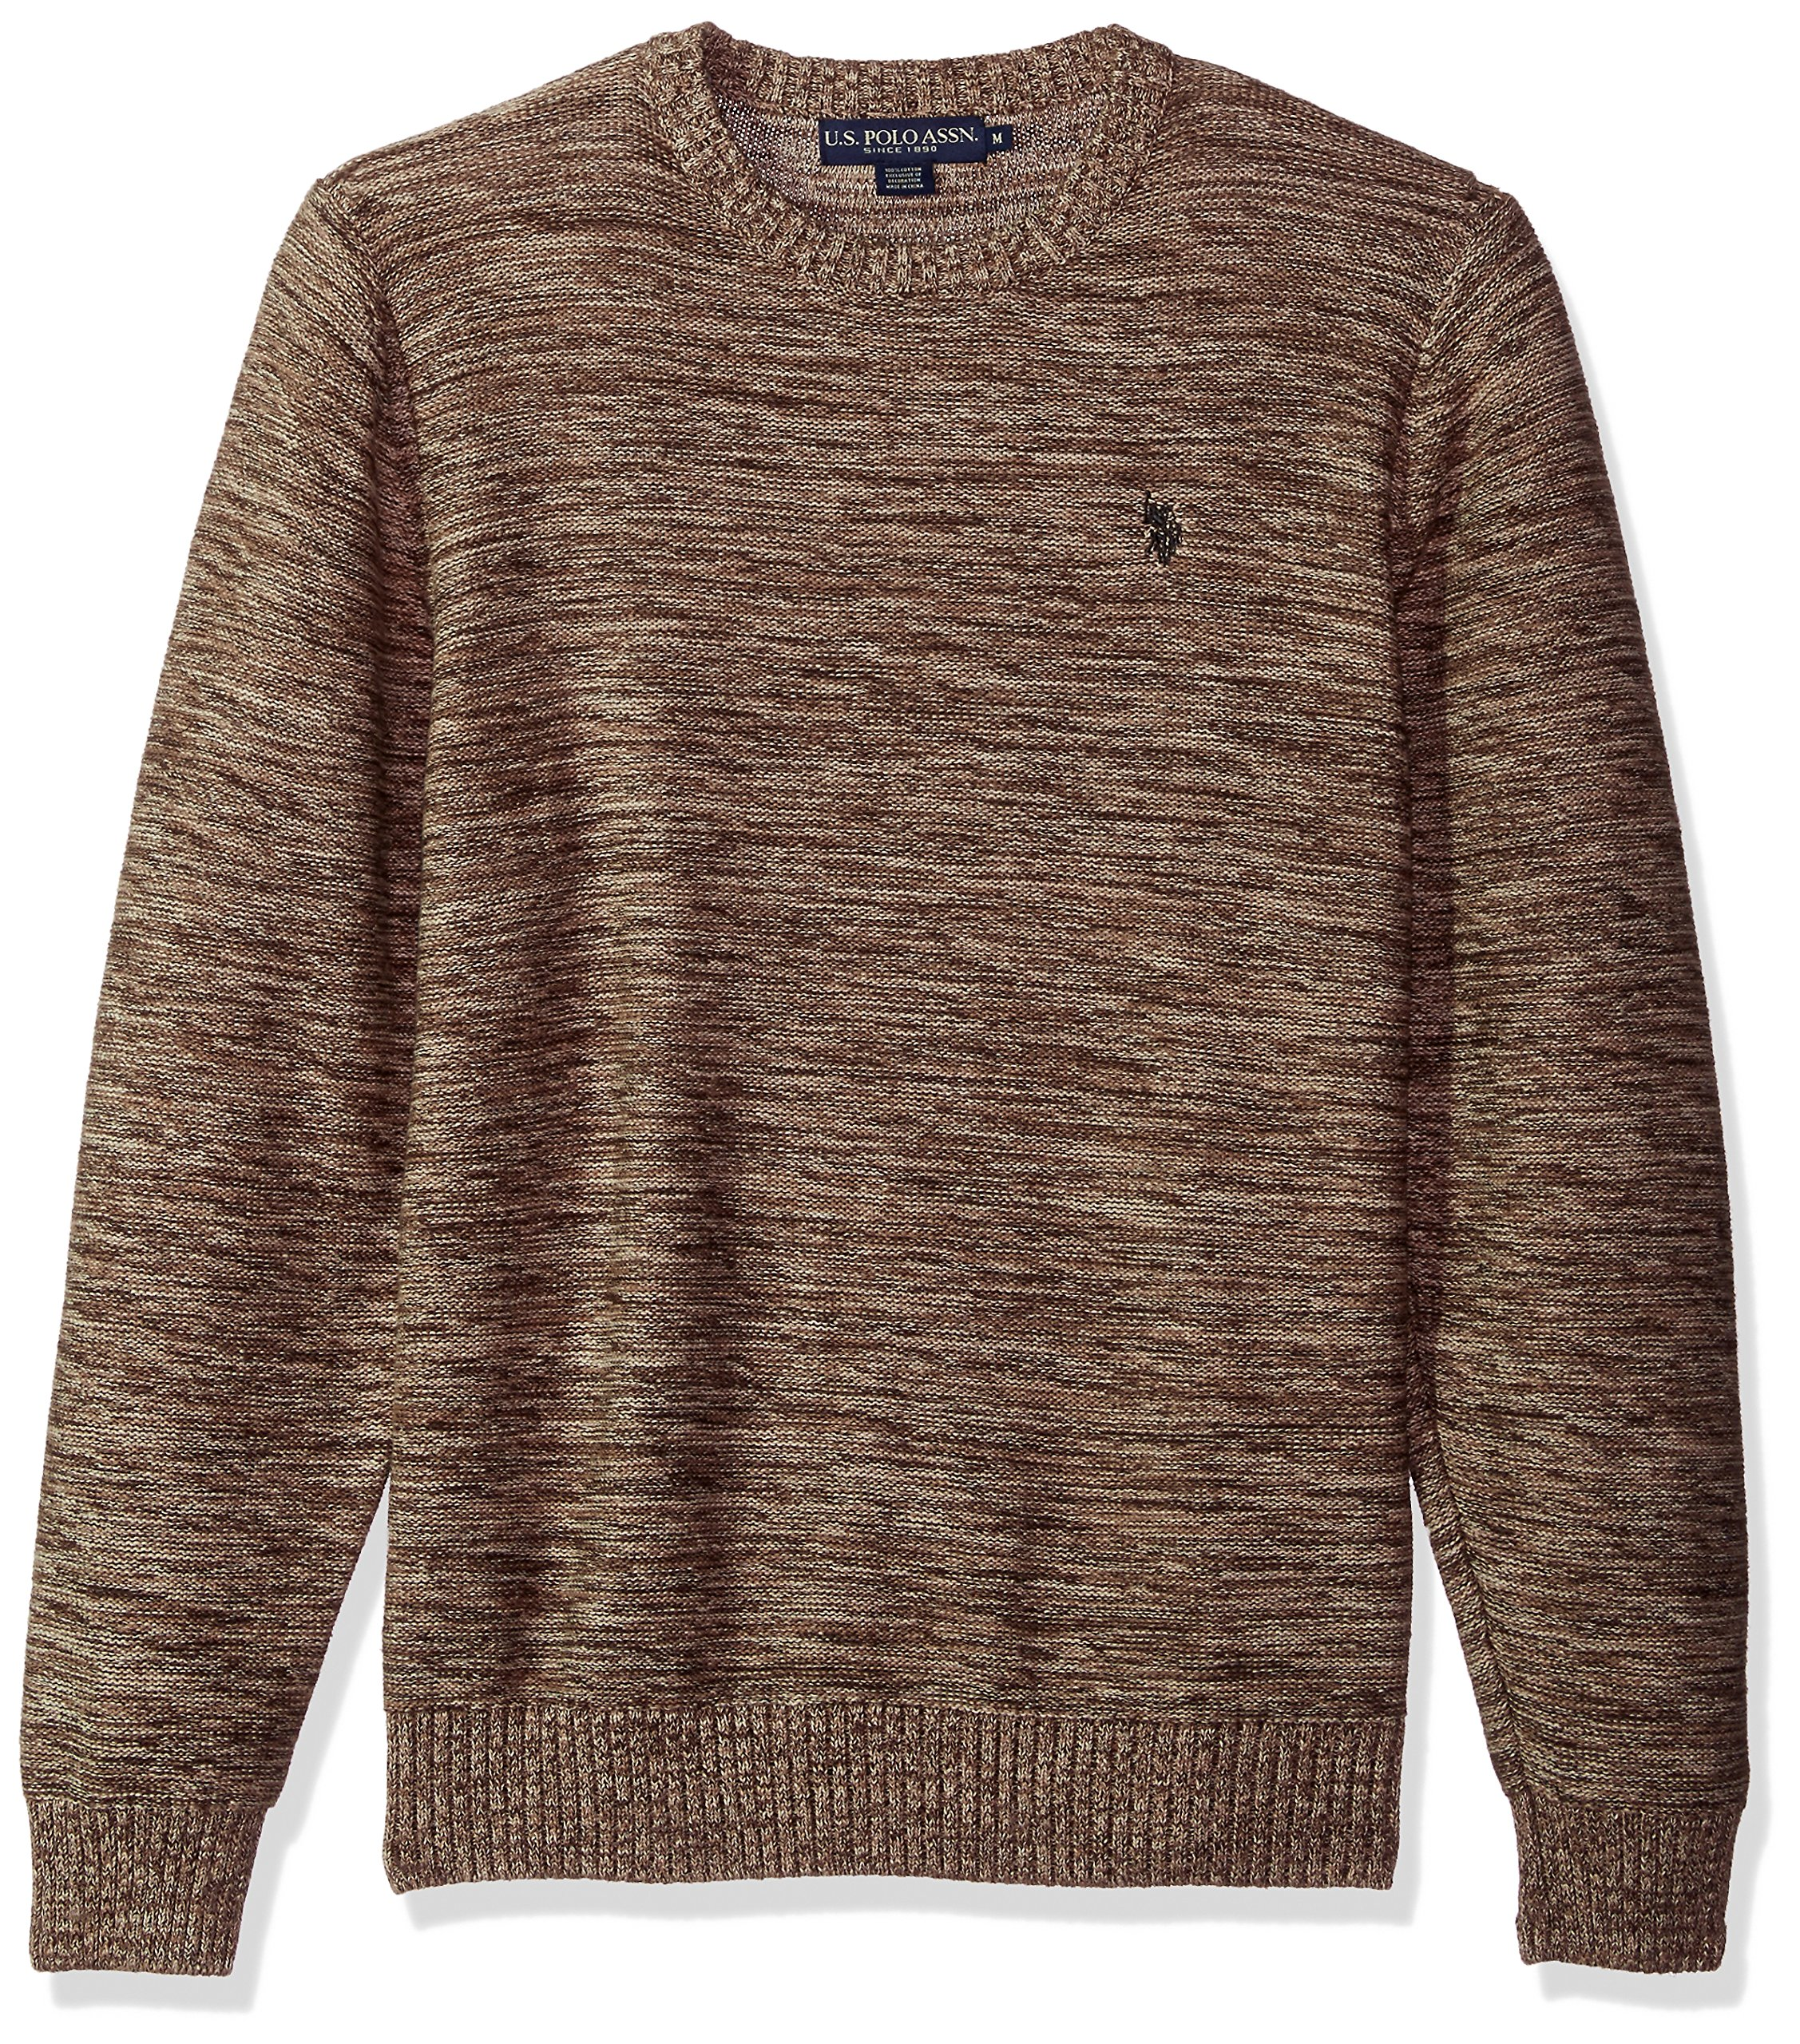 U.S. Polo Assn. Men's MARL Reverse Jersey Crew Neck Sweater, Coffee MARL, Medium